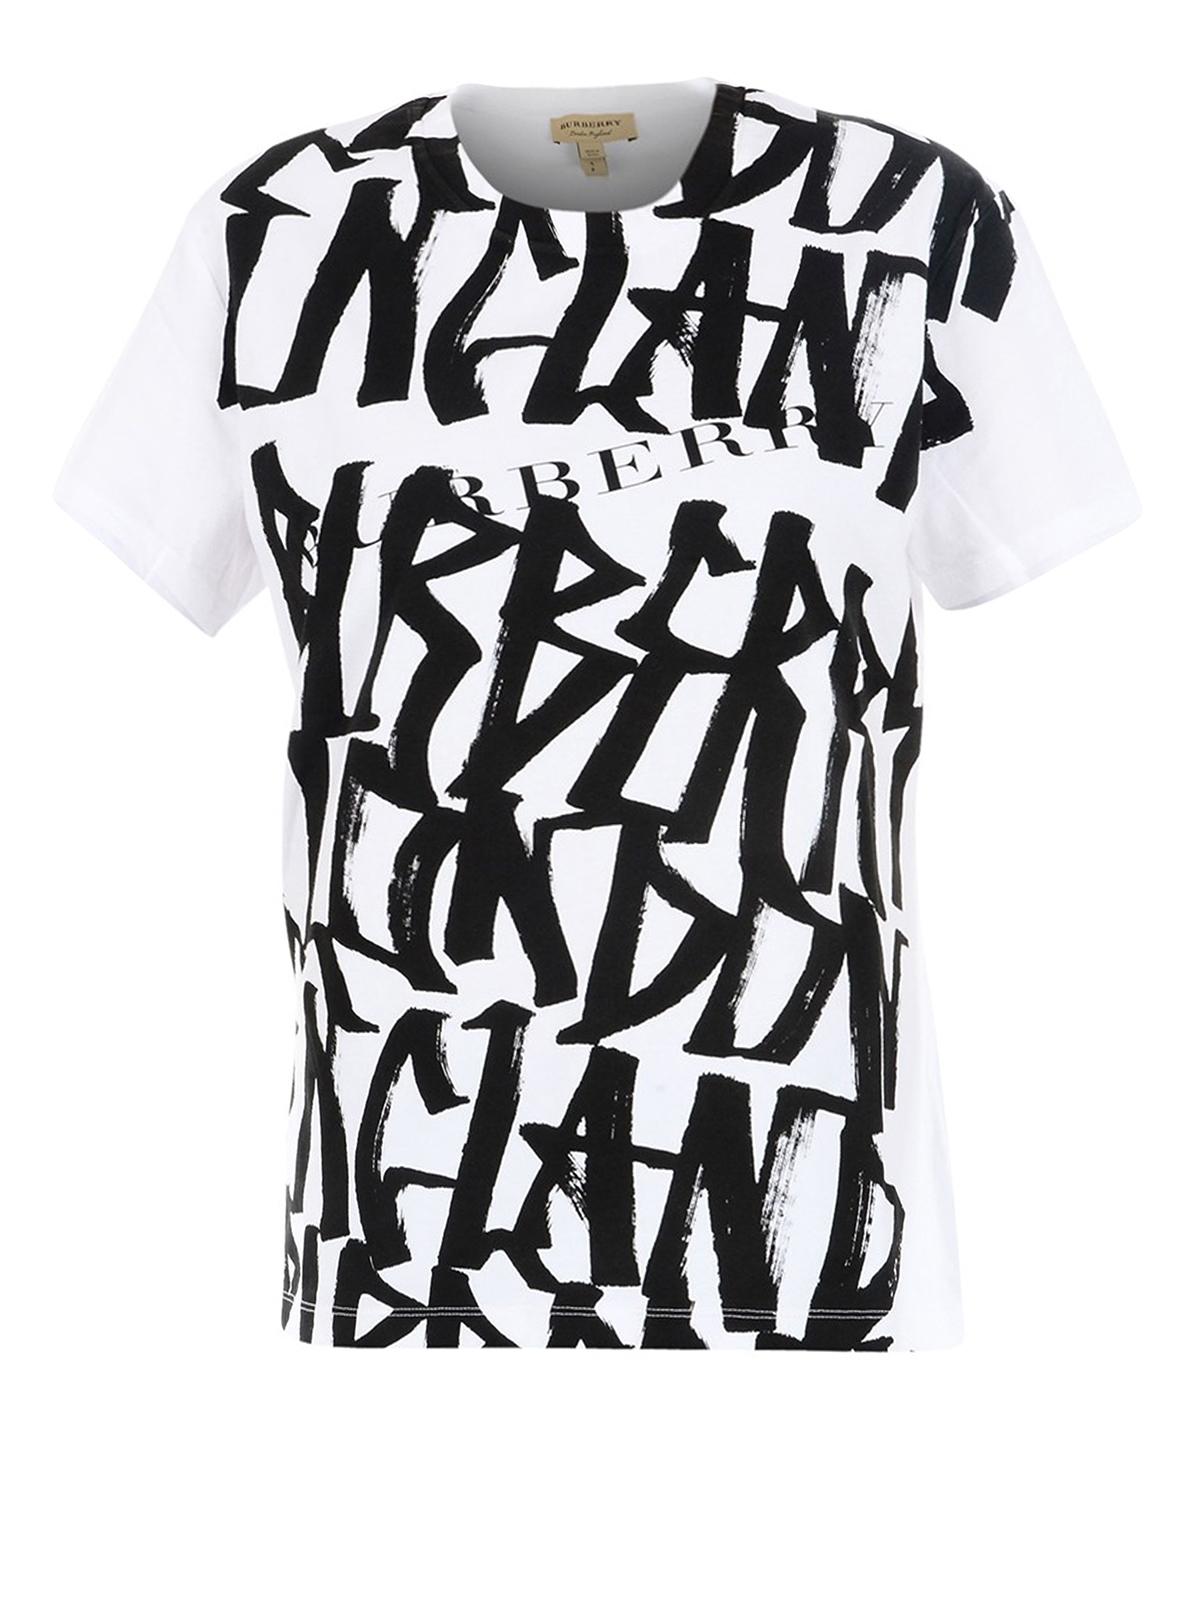 Burberry Shirt Günstige schuhe Online Shop Sale für Männer